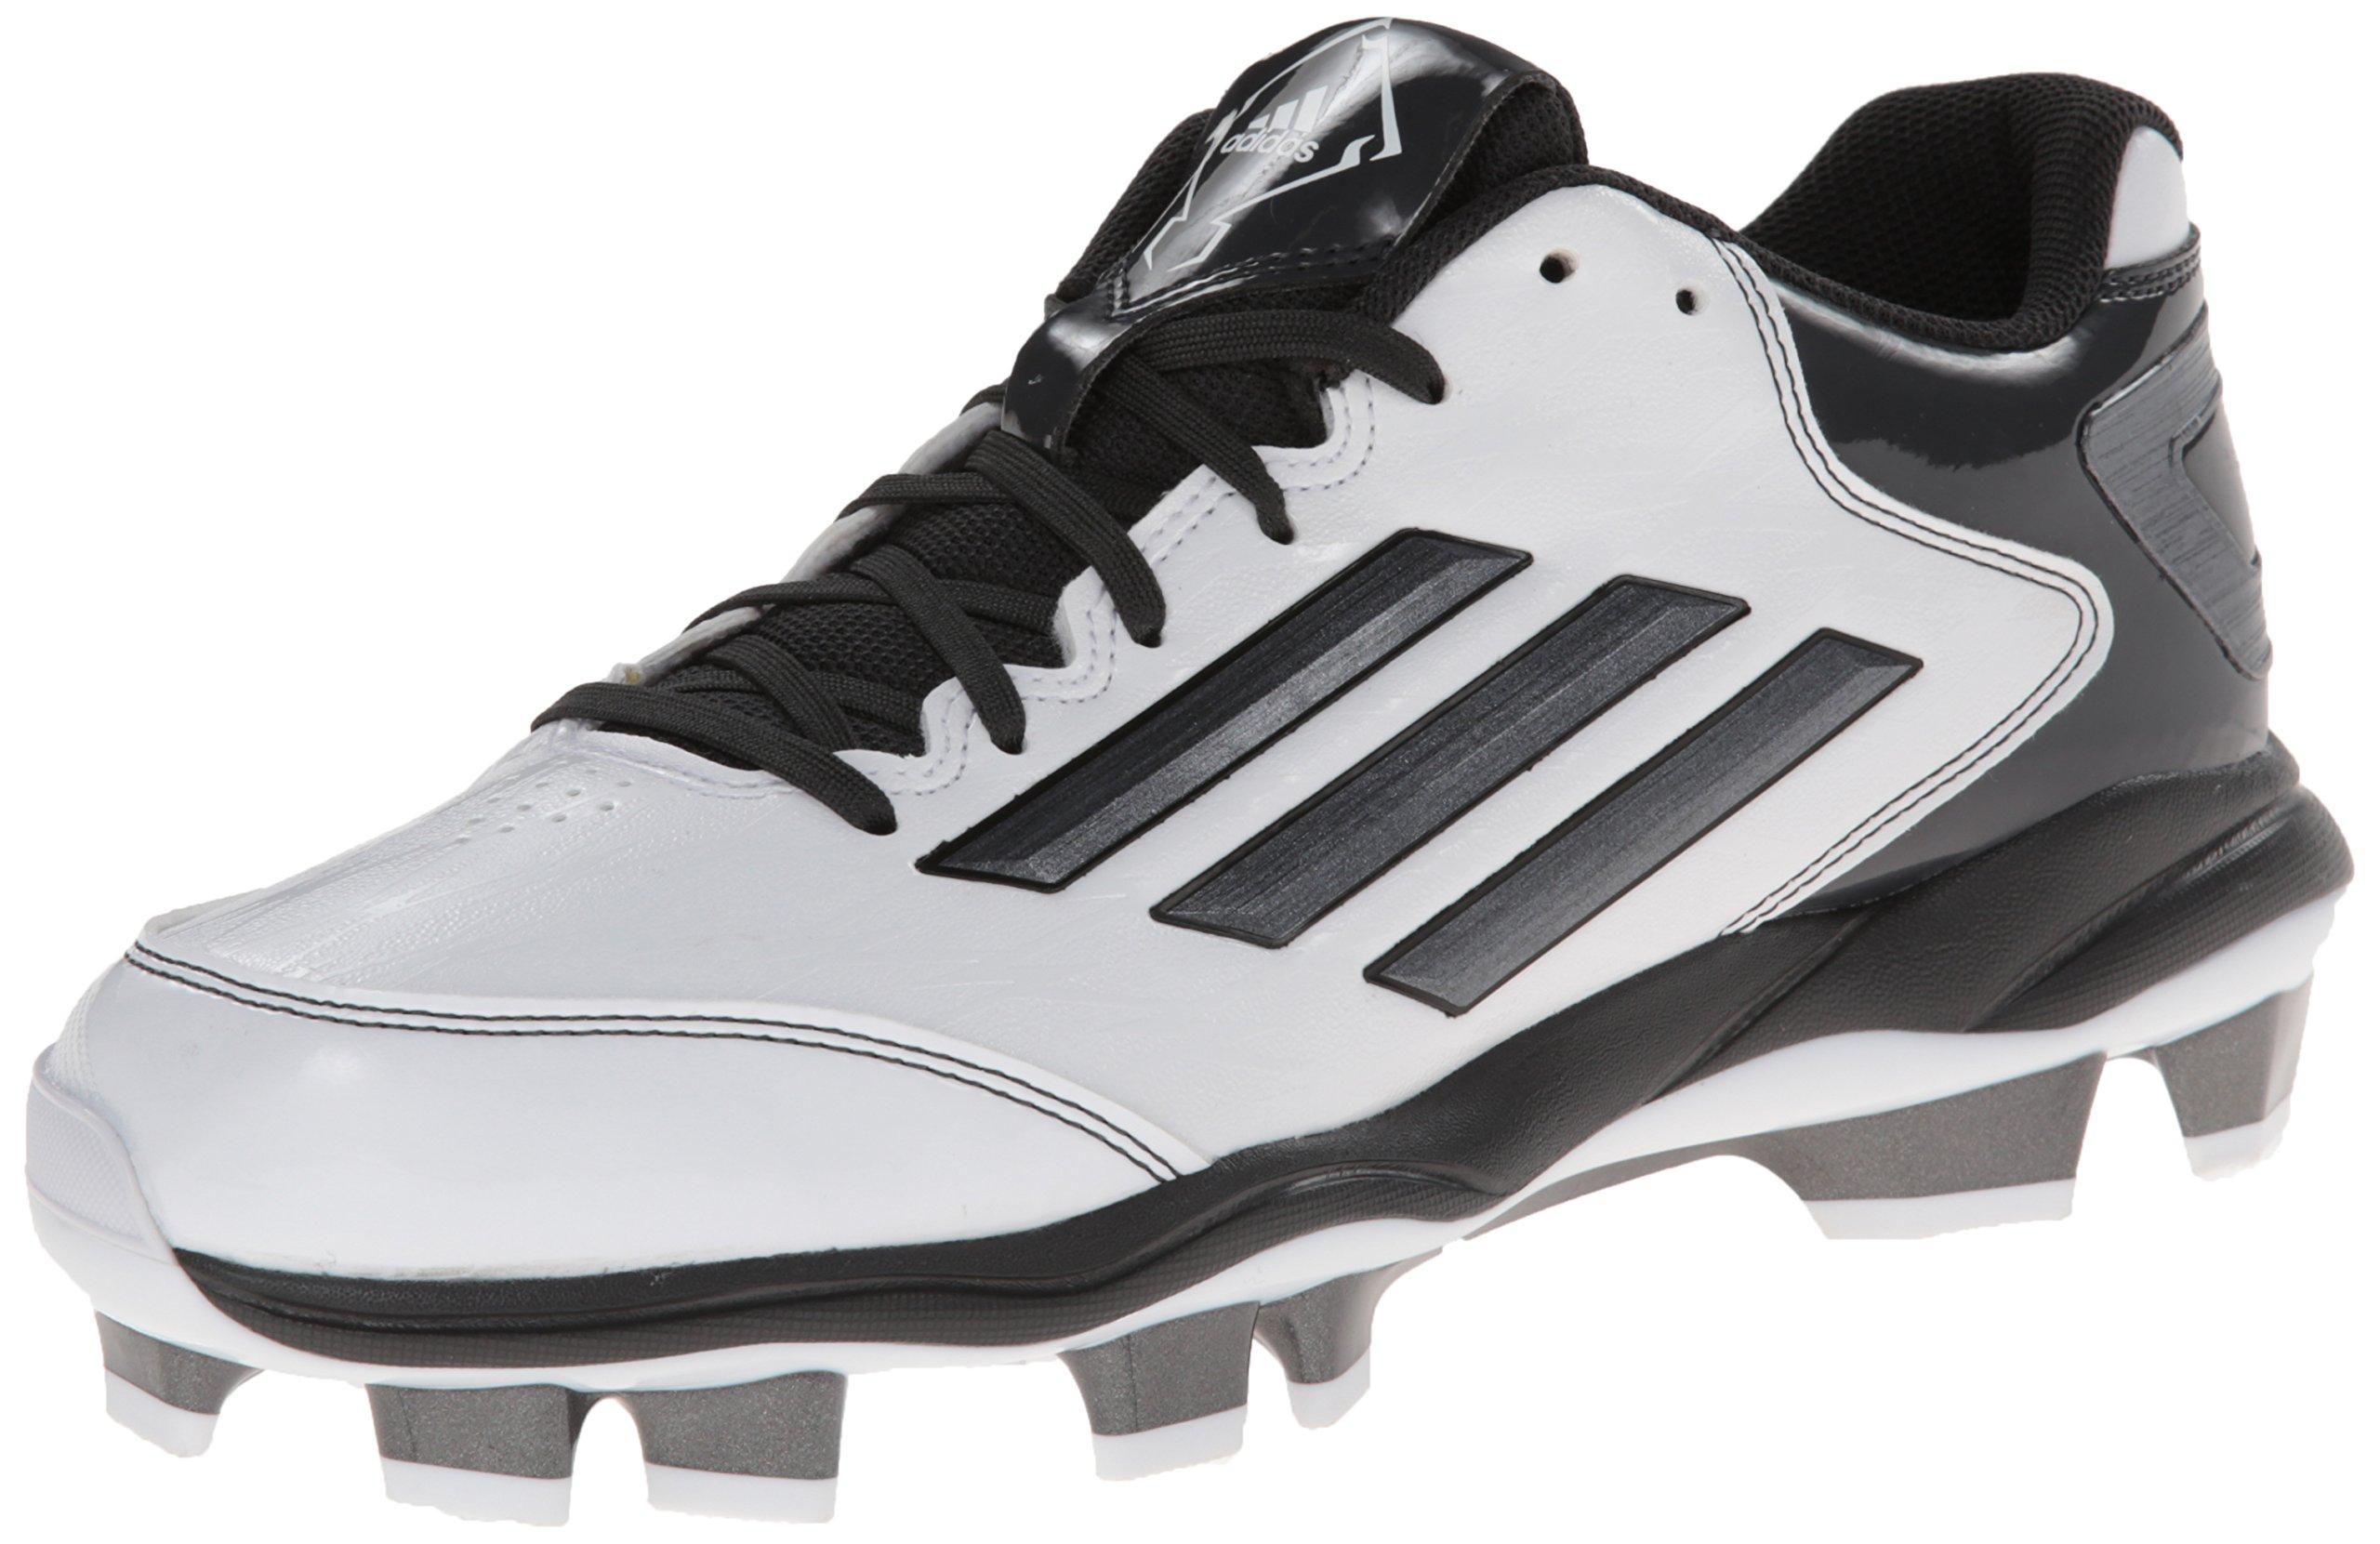 adidas Performance Women's PowerAlley 2 TPU W Softball Cleat, White/Carbon/Black, 7.5 M US